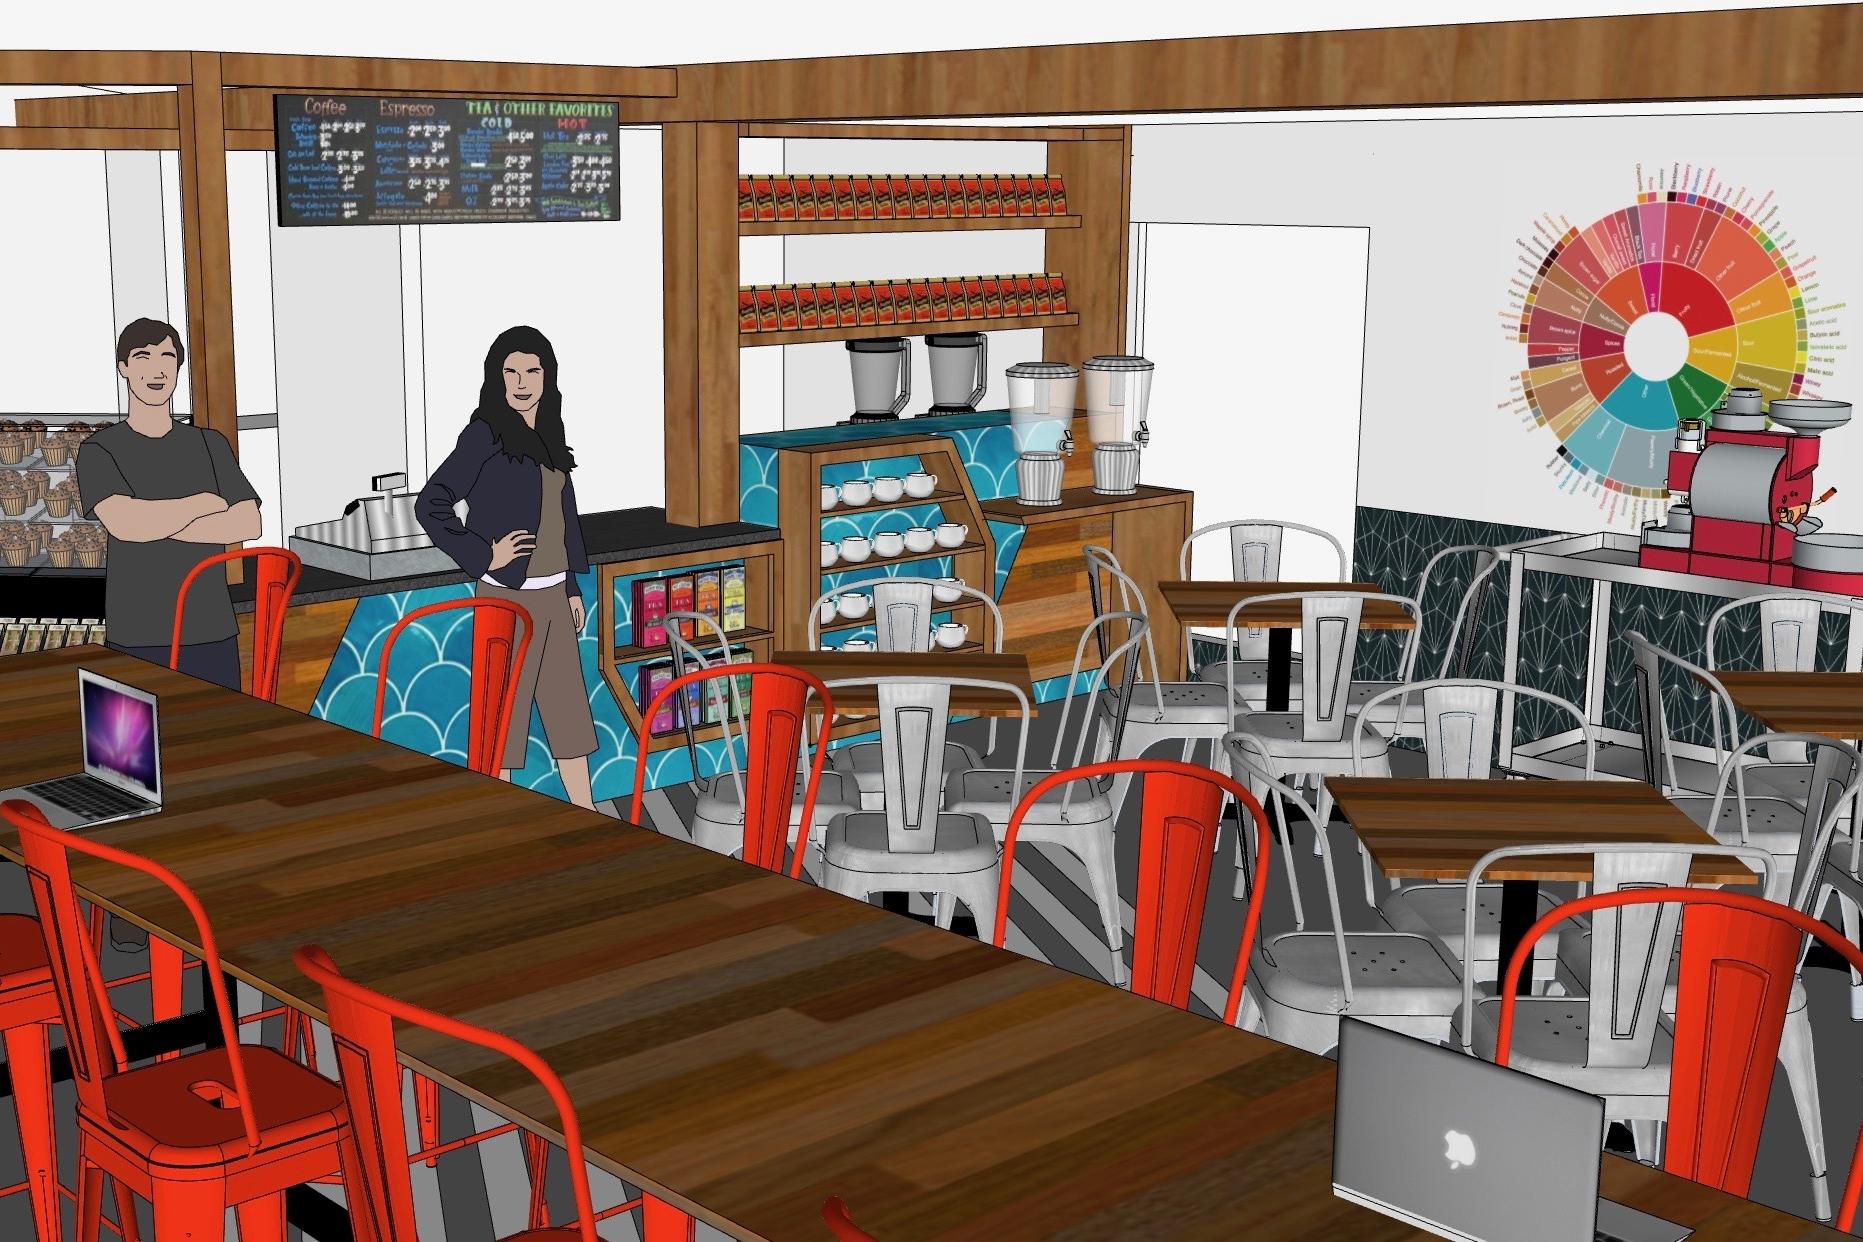 FULL-SERVICE COMMERCIAL DESIGN - + New Construction & Renovation for Restaurants, Bars, Offices, Retail, Hotels+ Brand Identity / Graphic Design+ Furniture Plans & Finish Selections+ Custom Furniture & Lighting Design+ Design Refresh